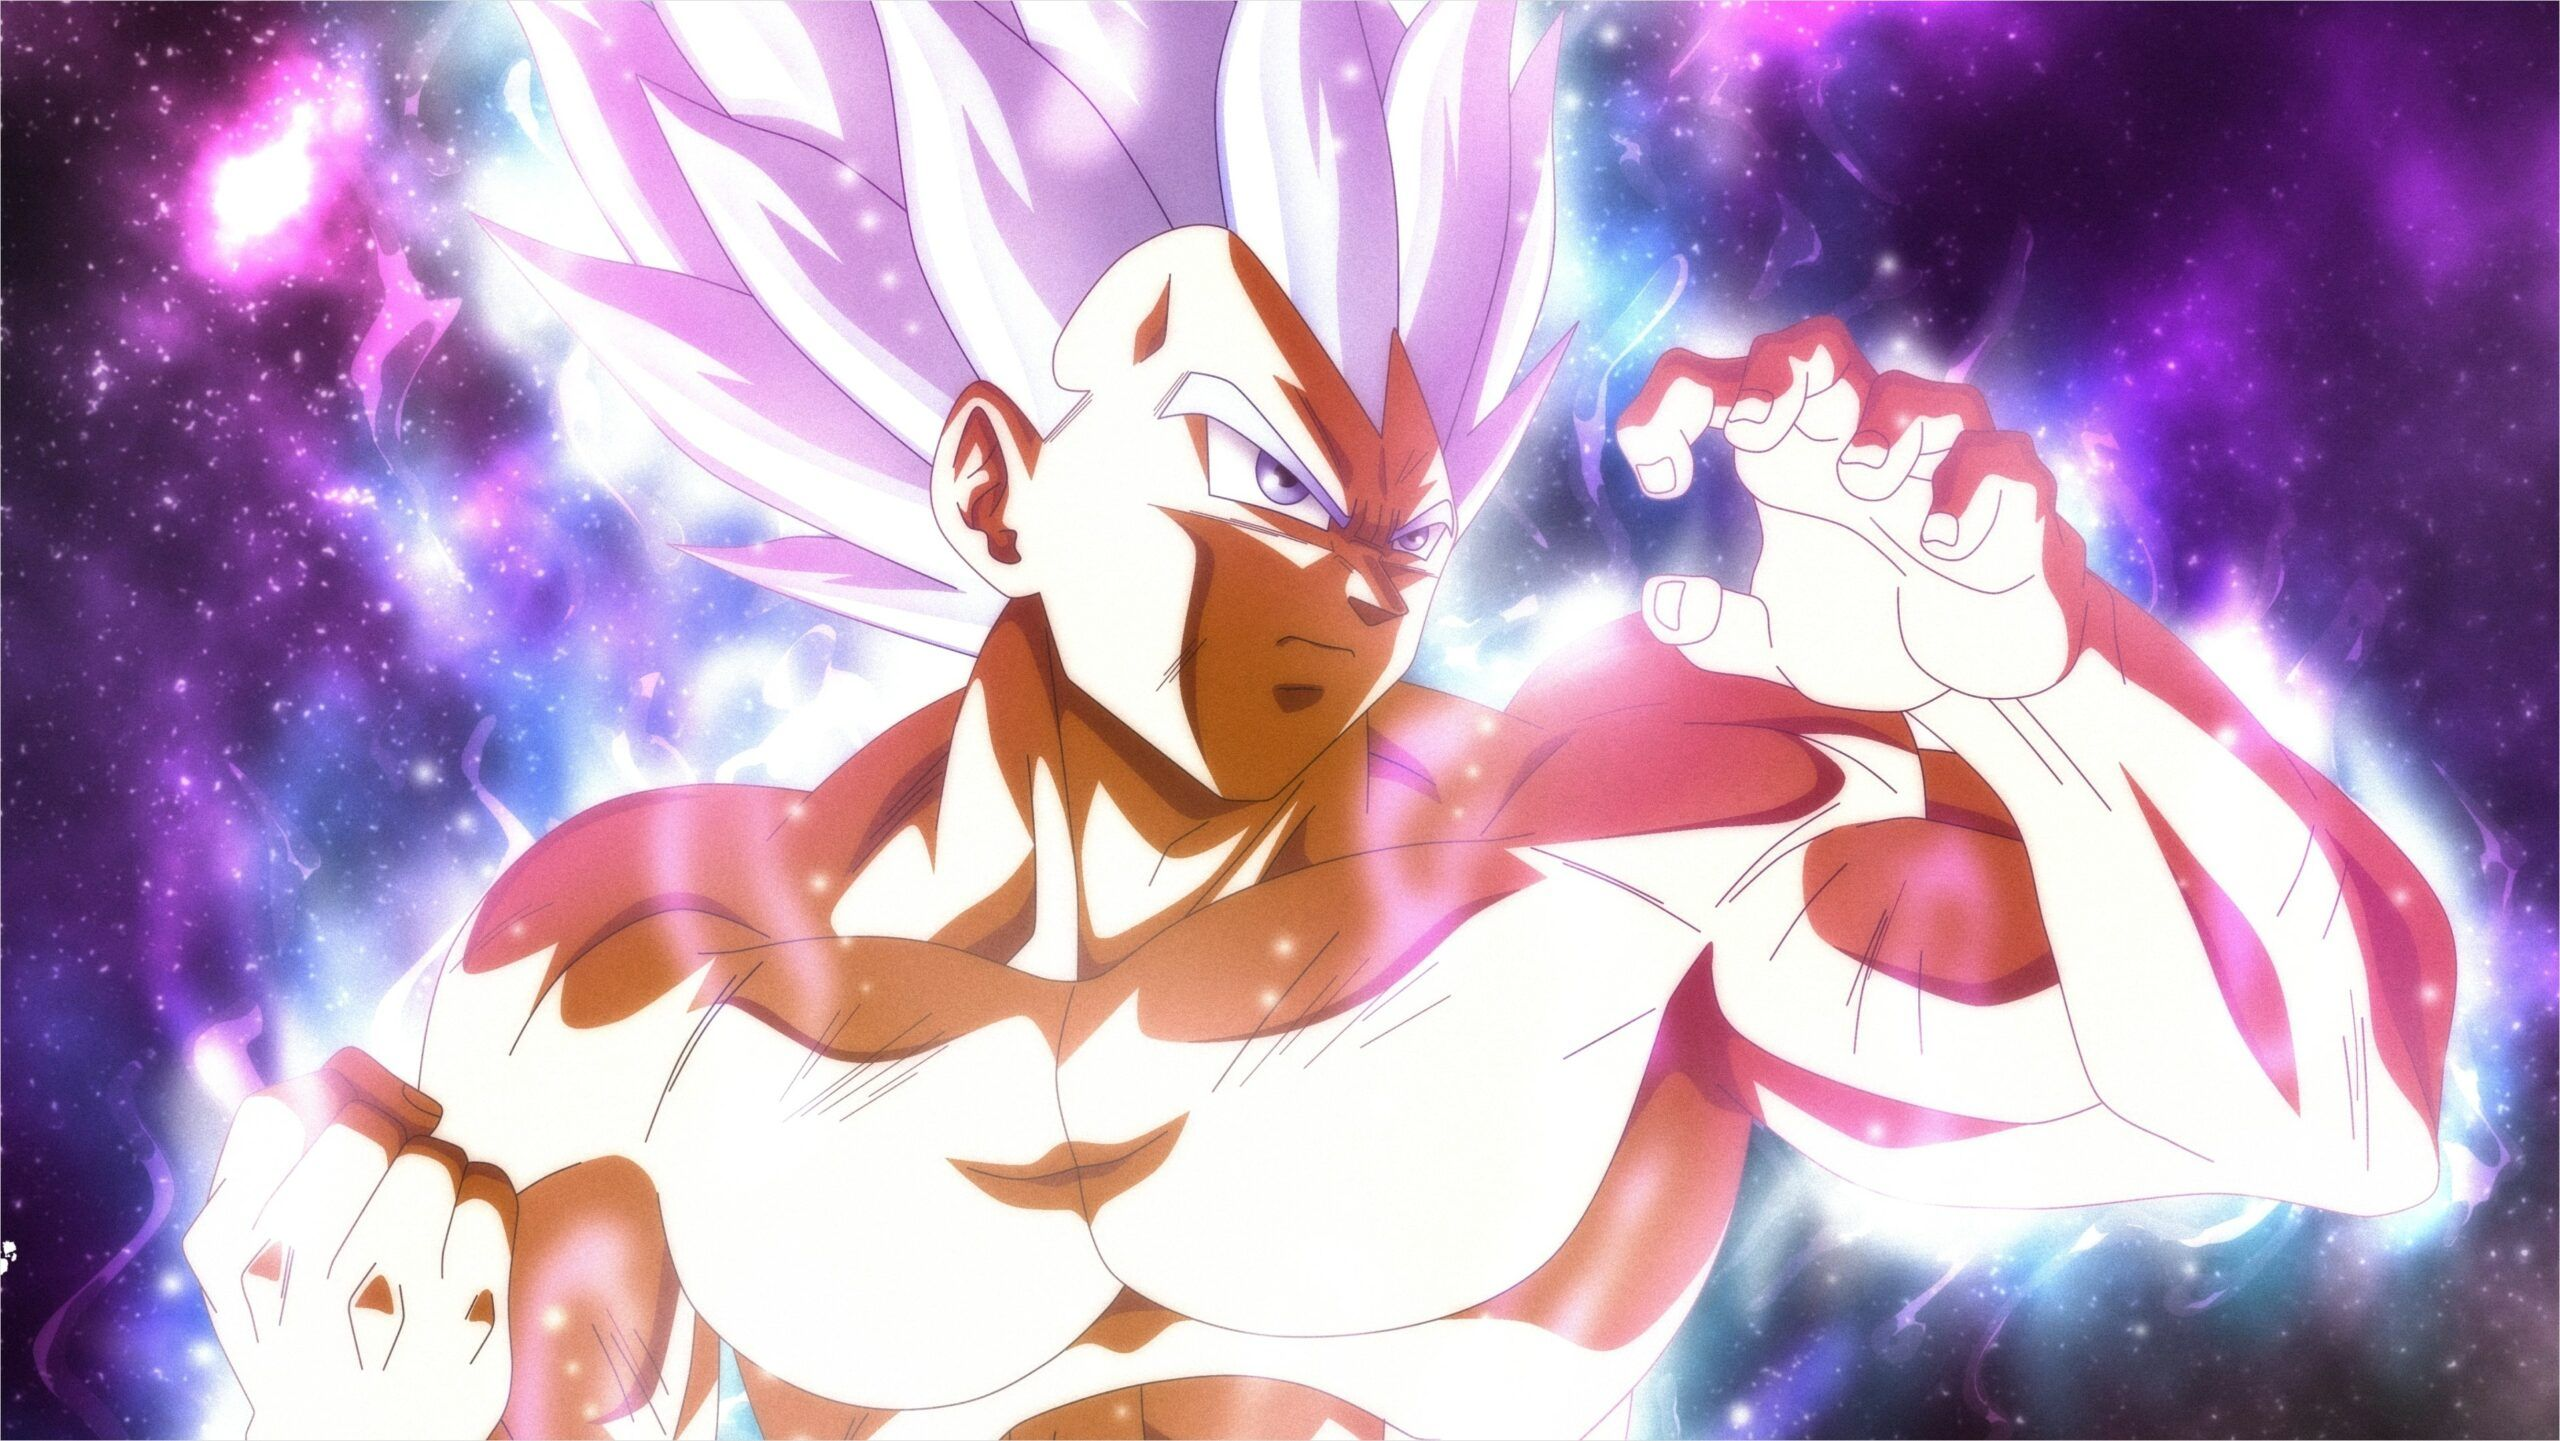 4k Wallpaper Ultrawide Anime Vegeta Dragon Ball Image Dragon Ball Super Goku Dragon Ball Art